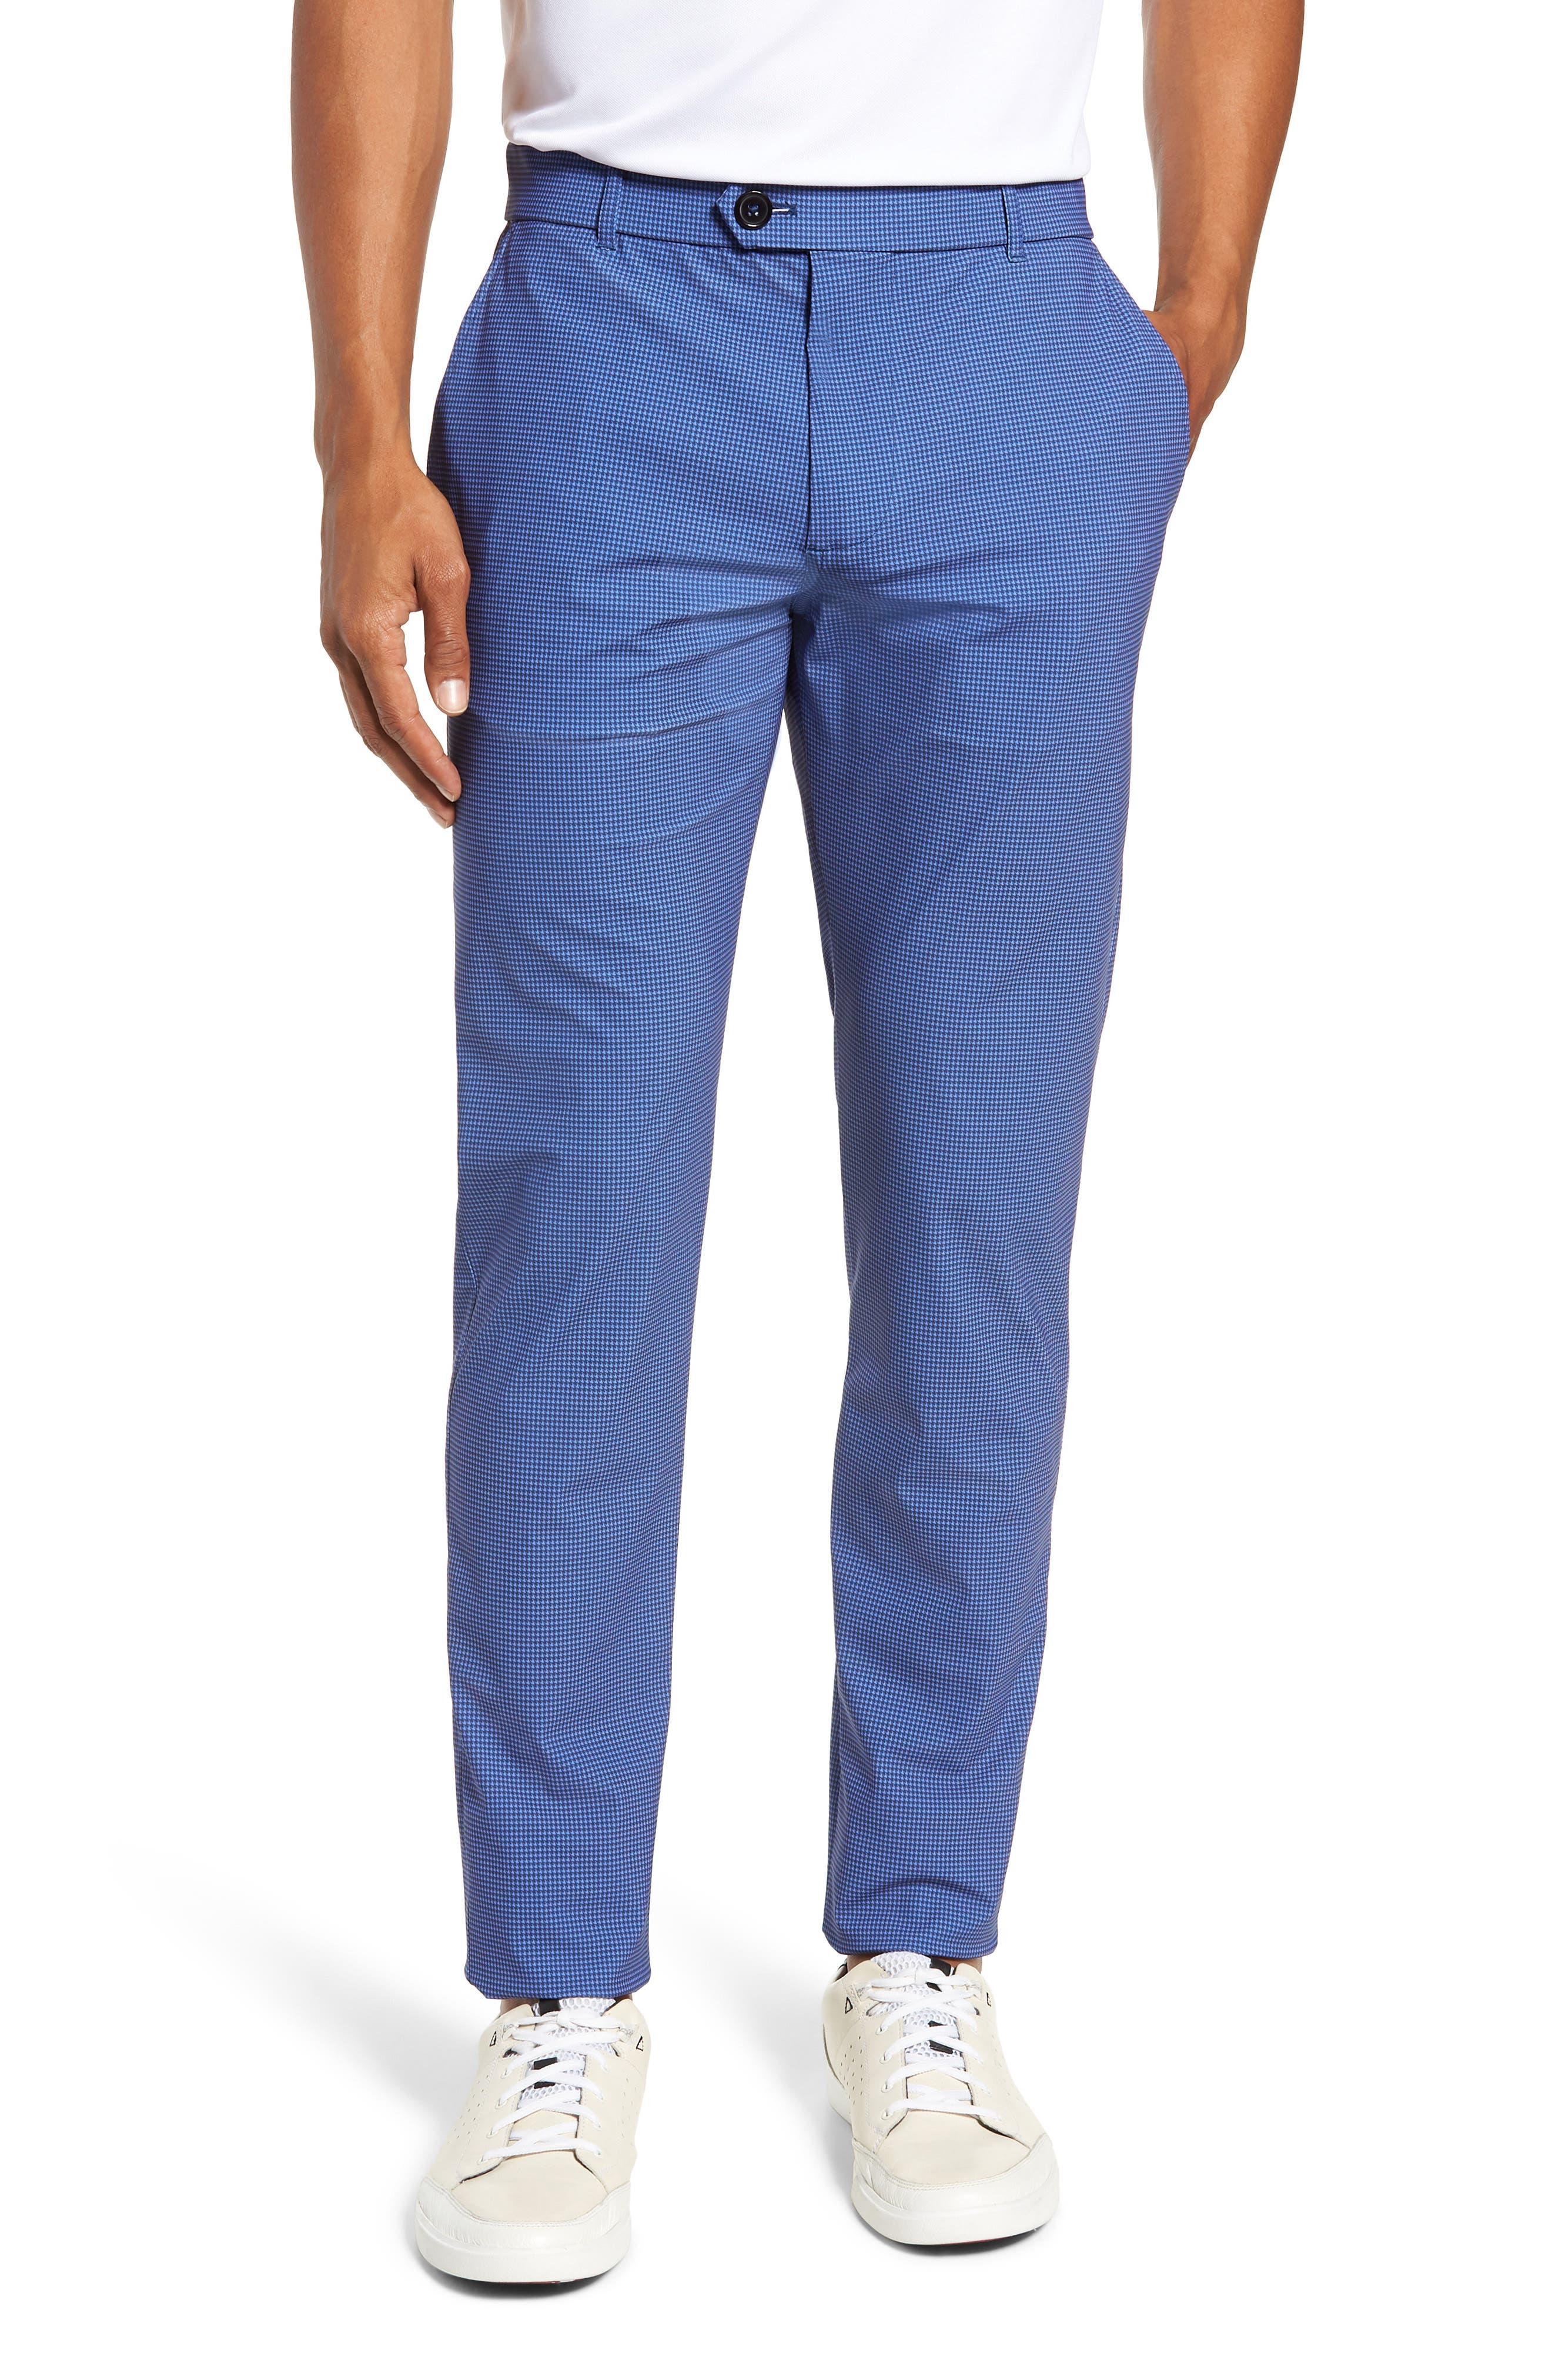 Greyson Montauk Wolvestooth Printed Pants, Blue